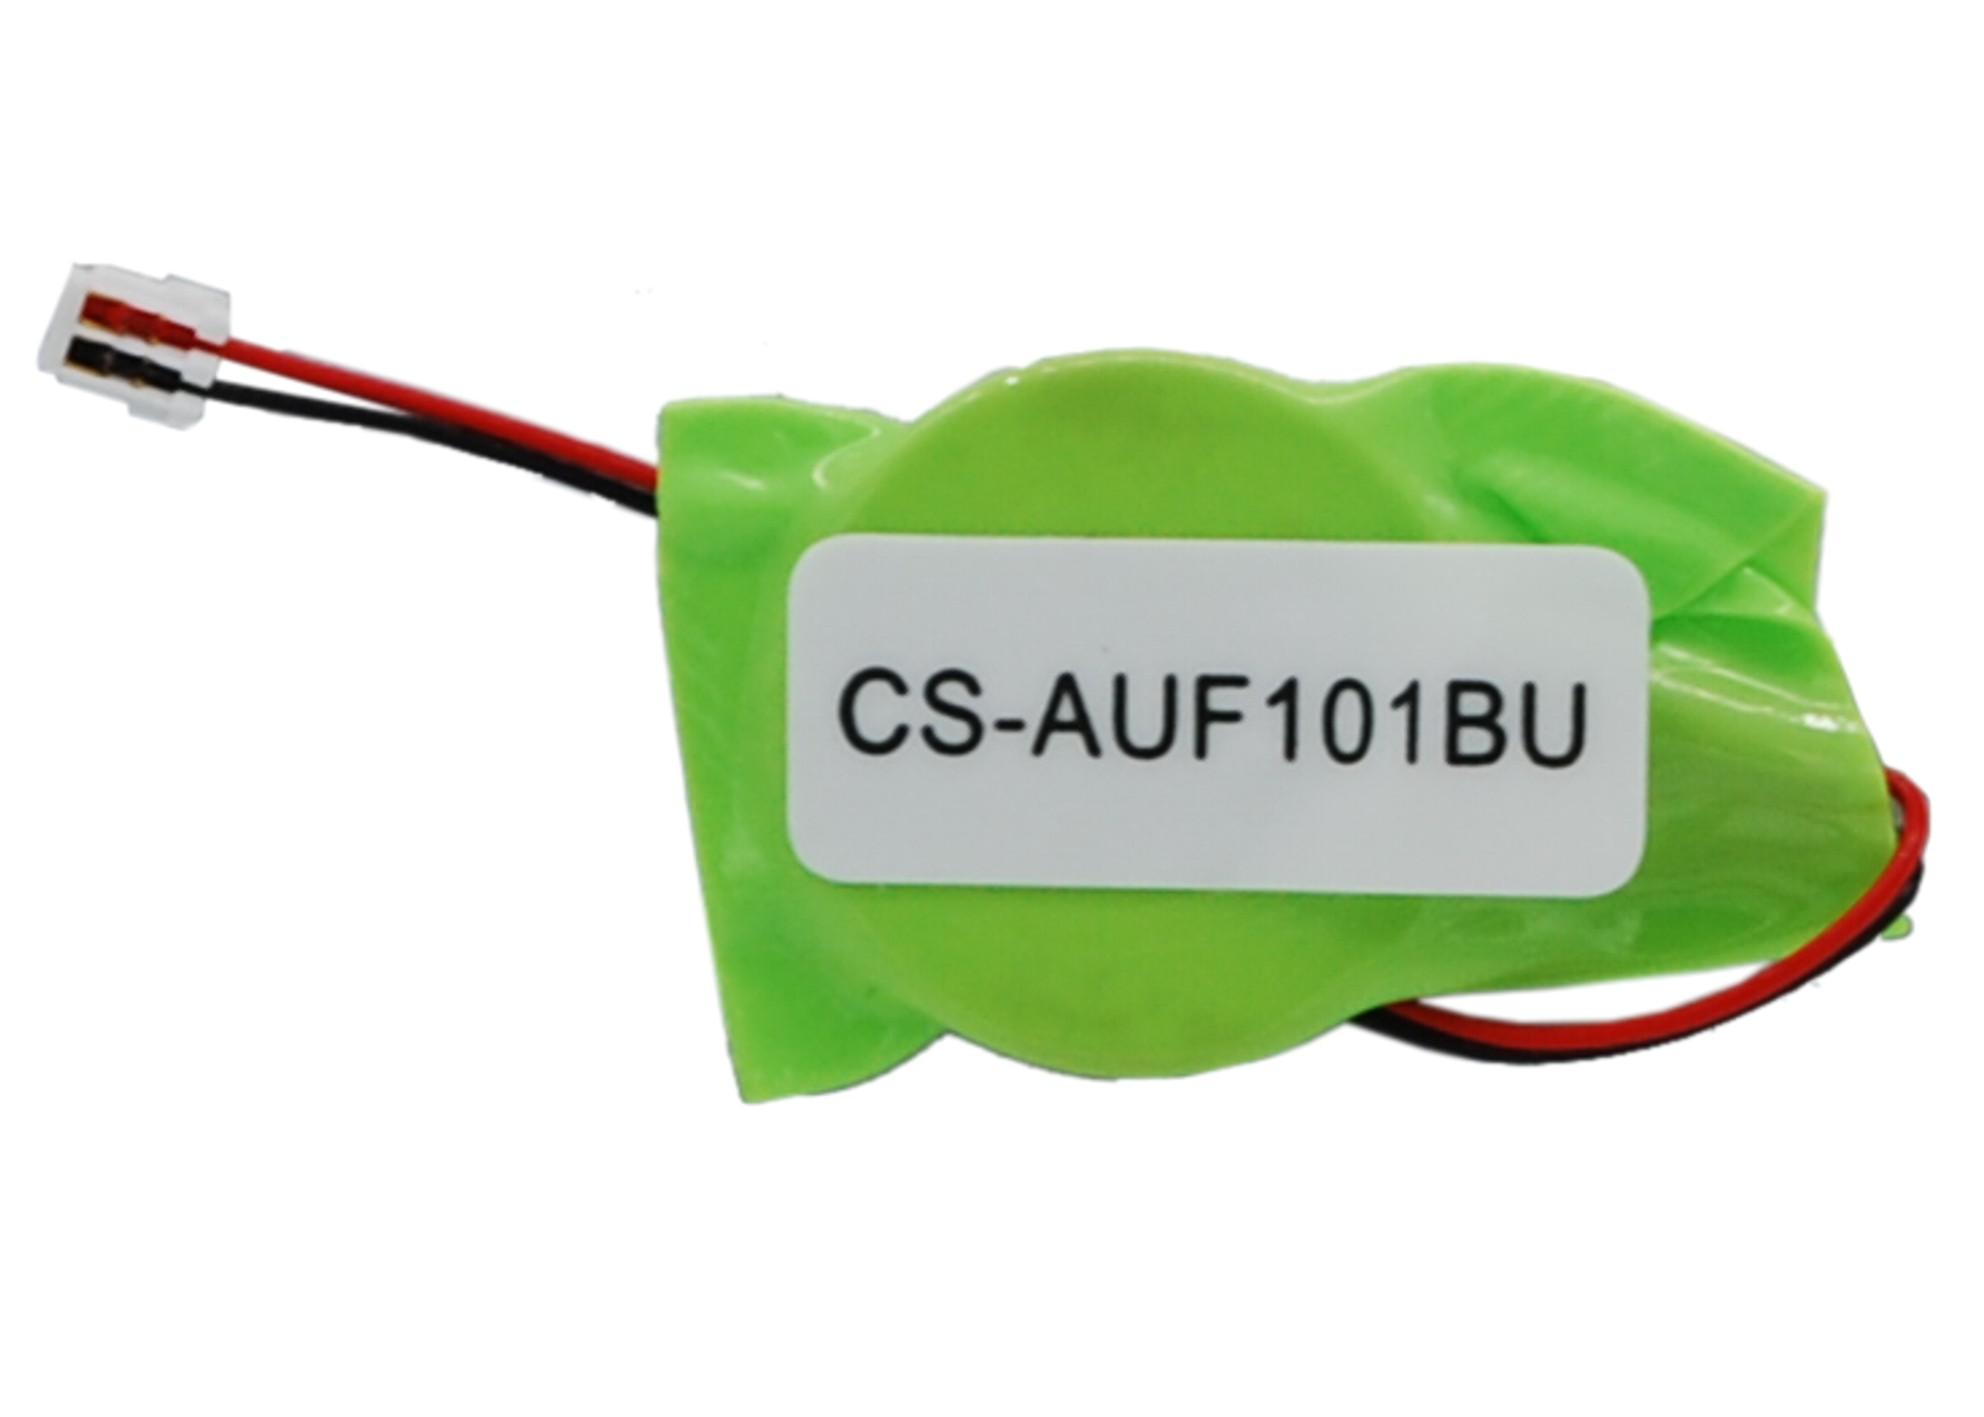 Cameron Sino baterie cmos pro ASUS Eee Pad Transformer TF101-1B048A 3V Li-ion 40mAh zelená - neoriginální